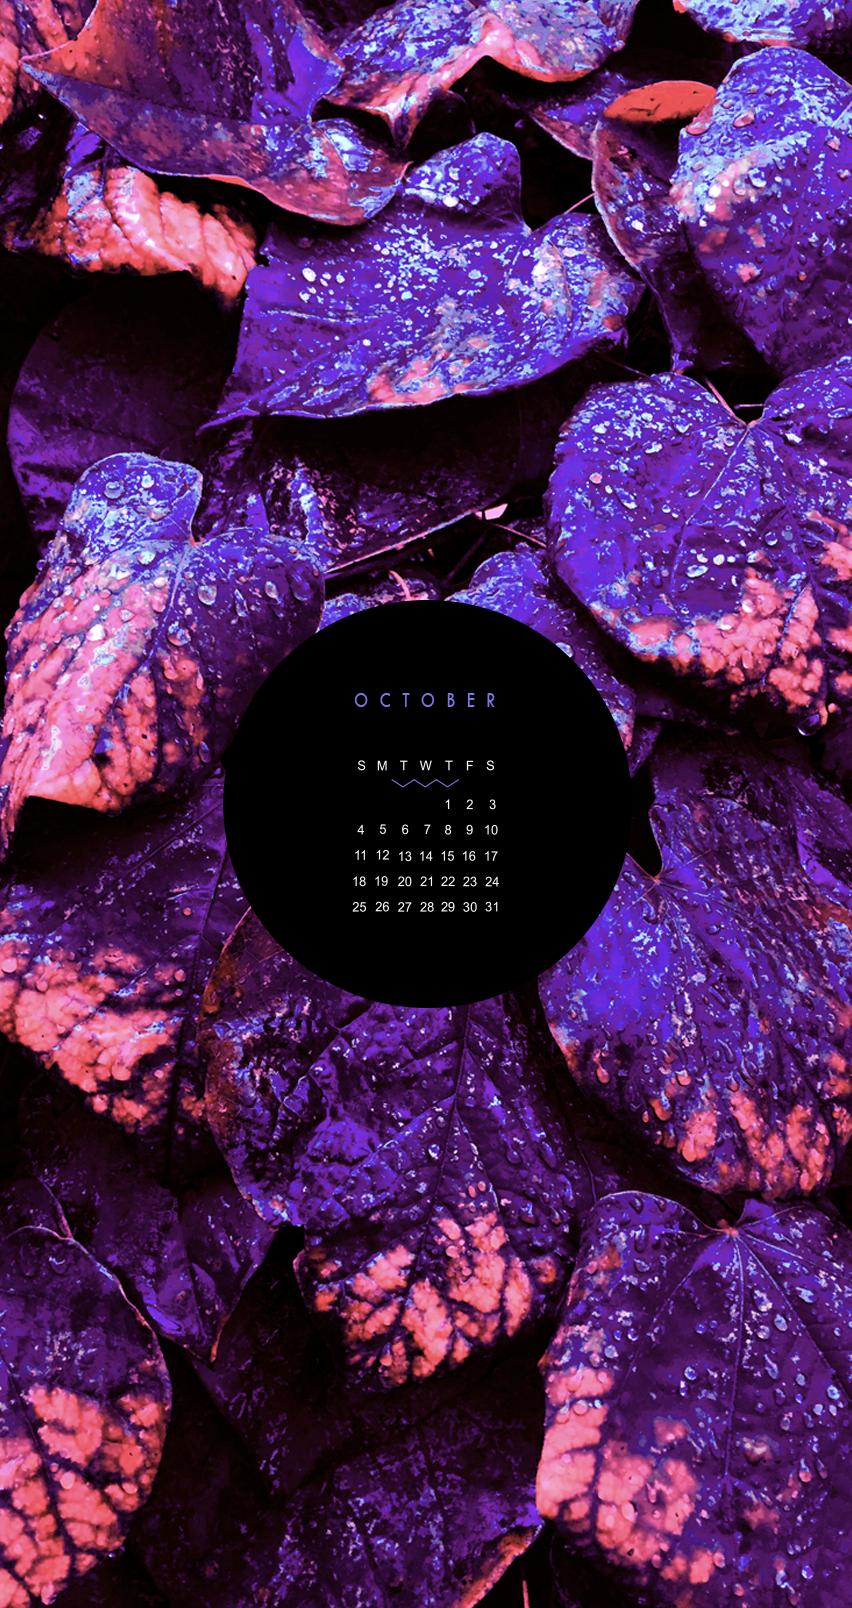 October-Iphone-Calendar-Wallpaper.png